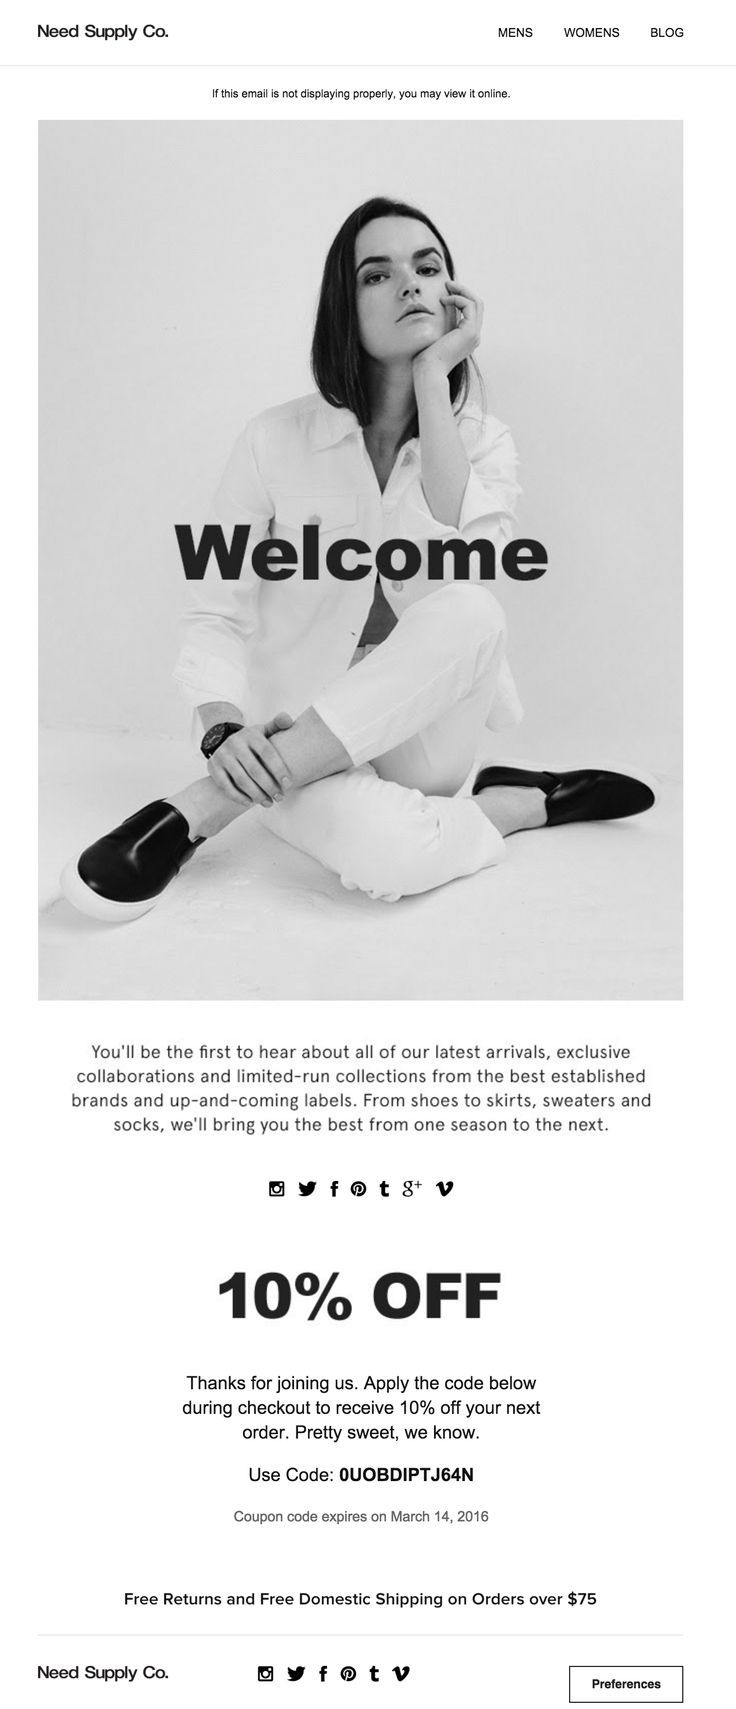 RH Mail | WEBSITE | Pinterest | Email design